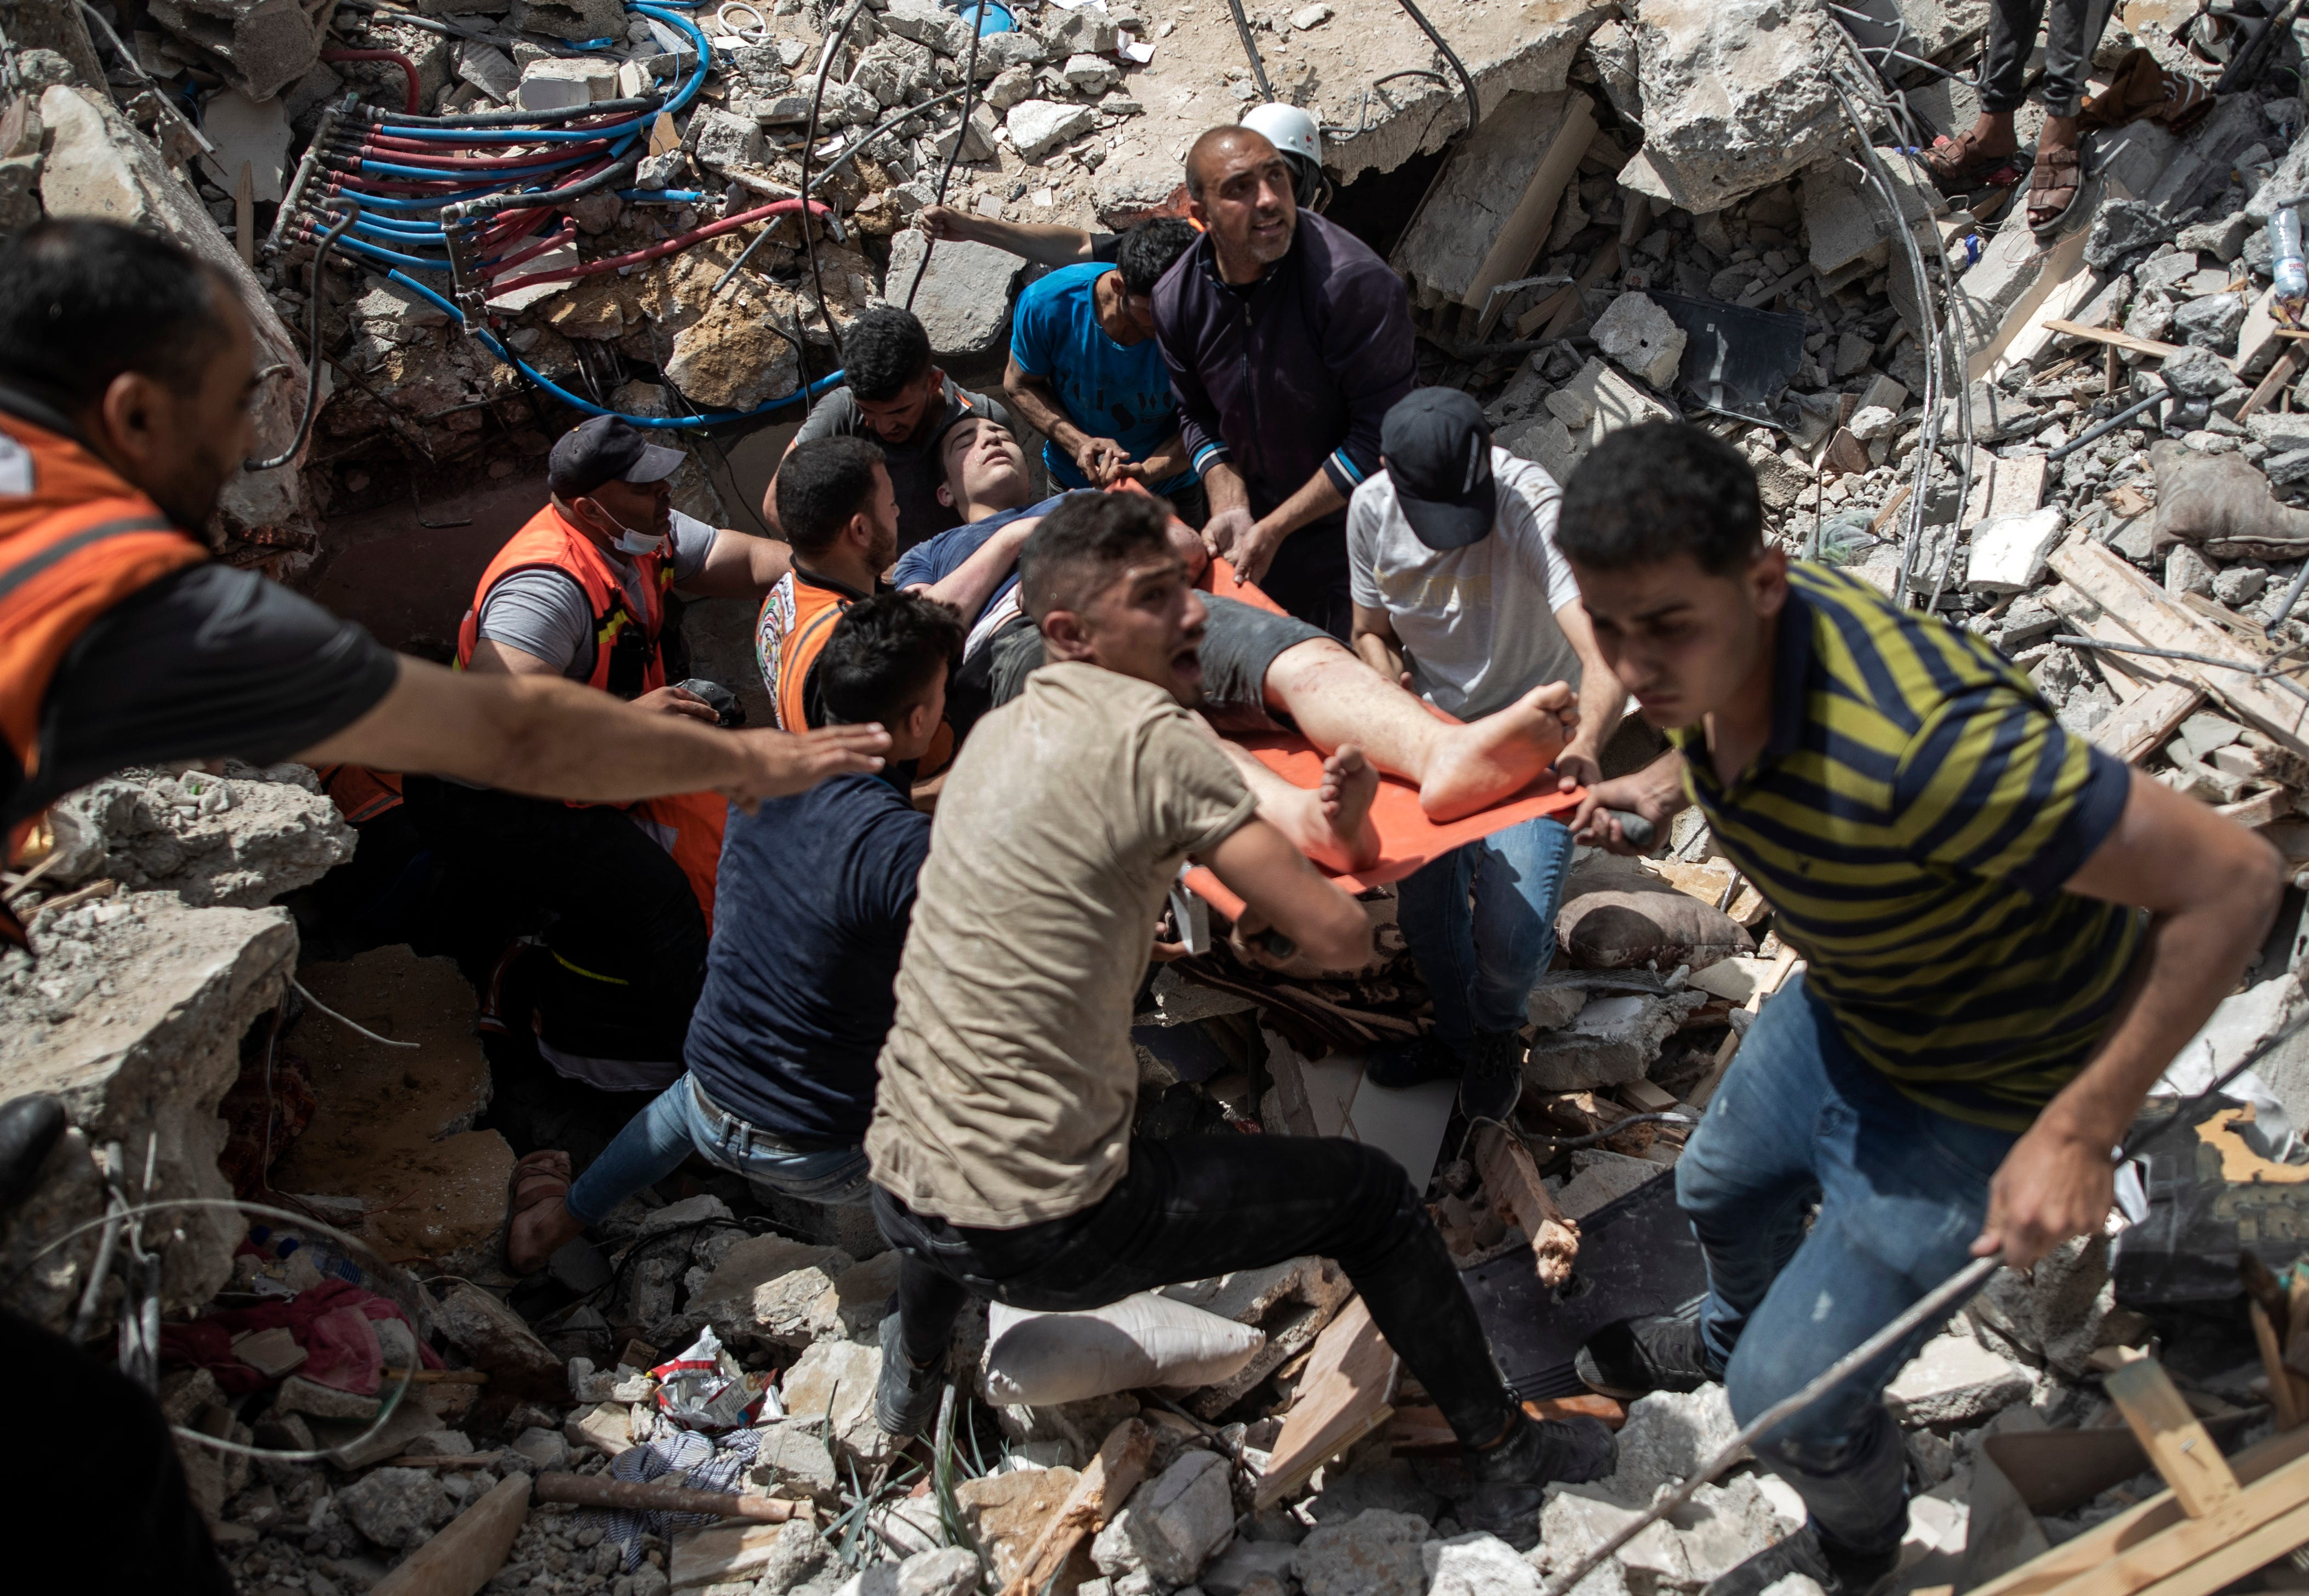 Gaza's health system buckling under repeated wars, blockade 2